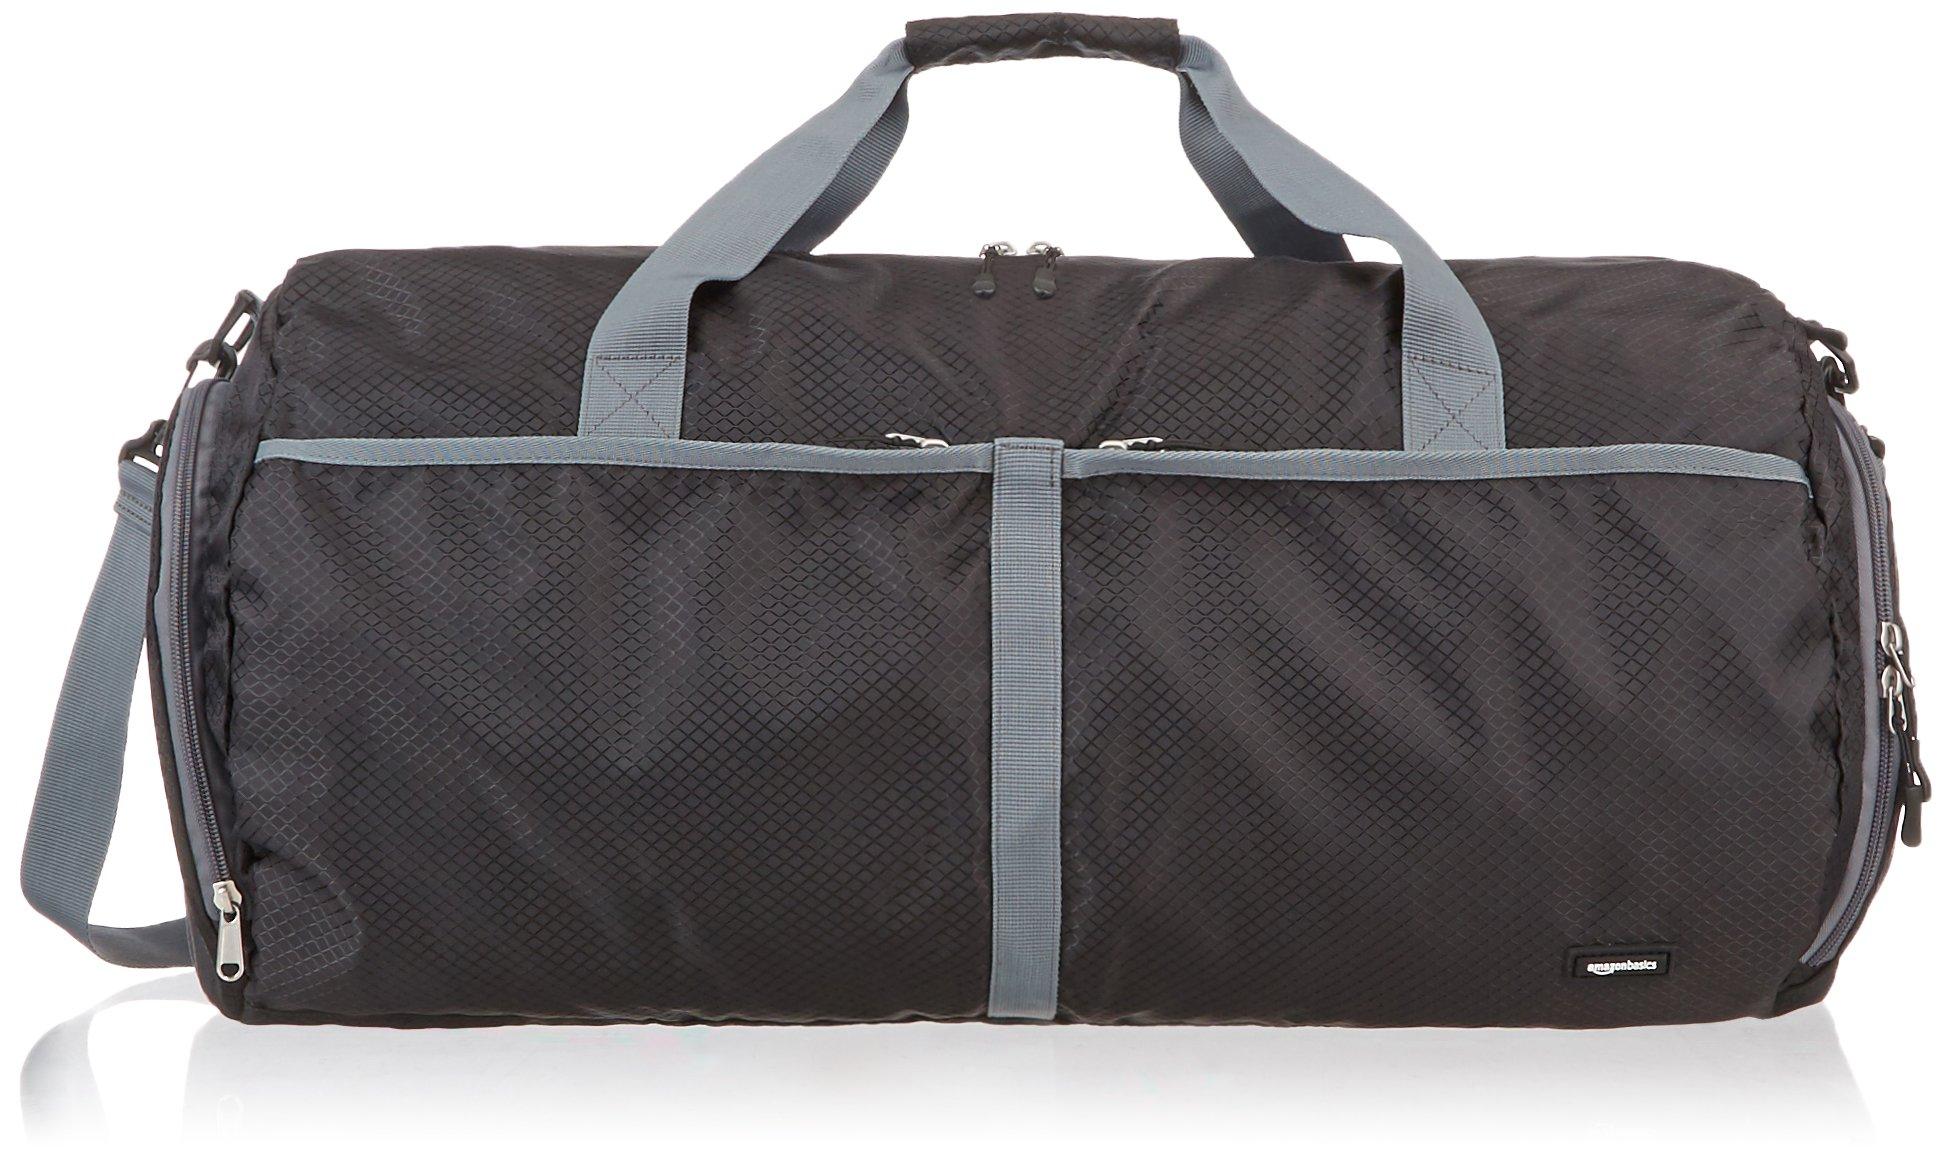 AmazonBasics Packable Travel Duffel, 23-inch, Black